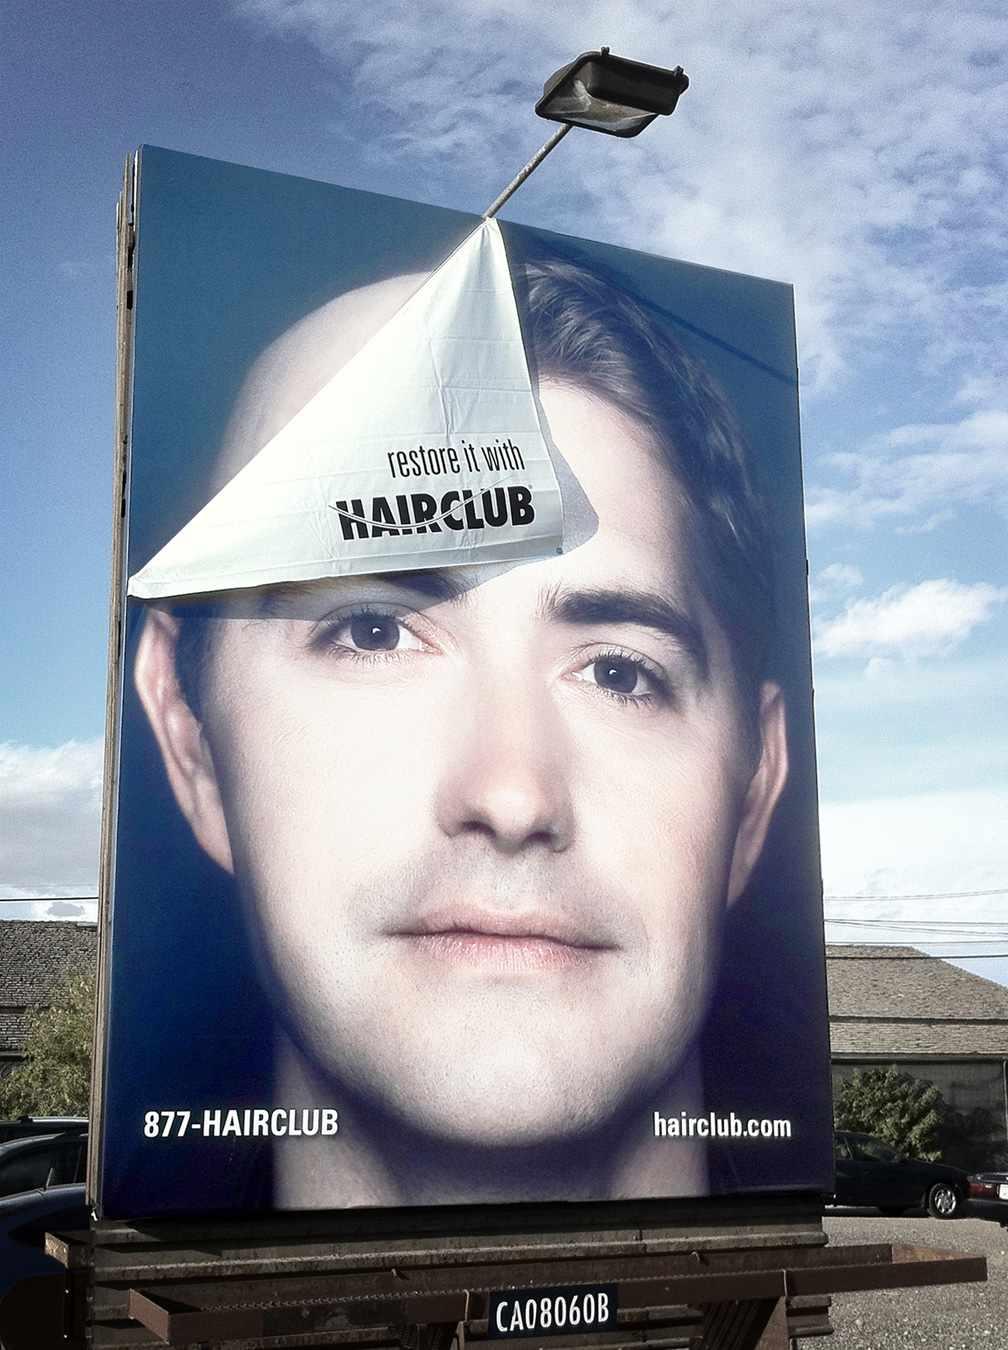 billboard-design-tips-and-examples-hairclub